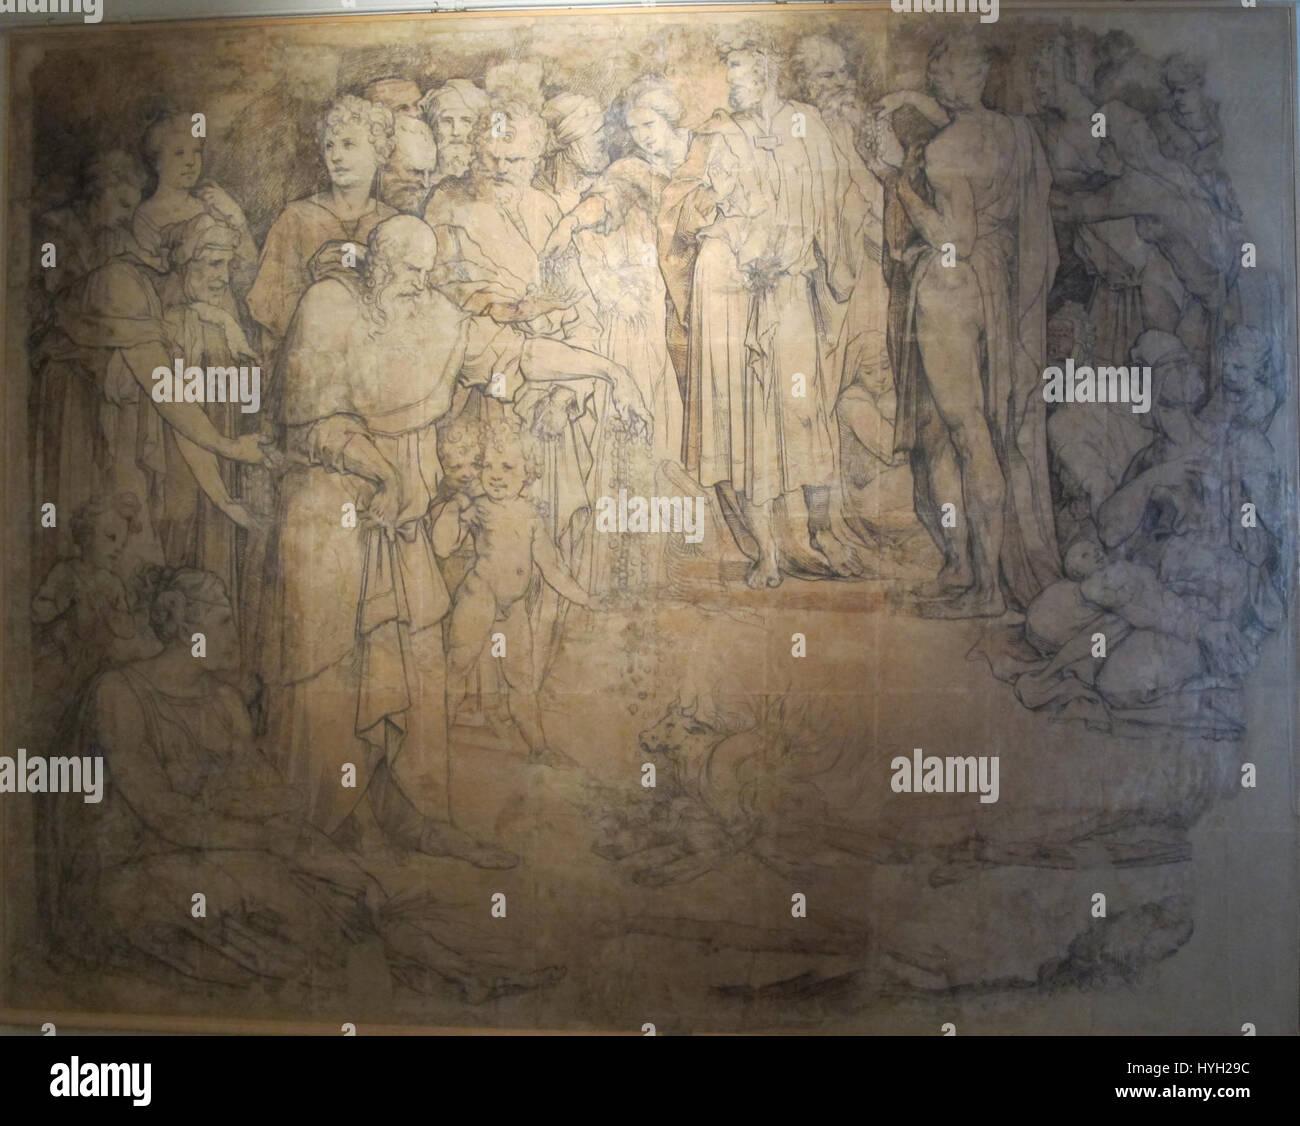 Beccafumi, cartone per pavimento duomo diena, 1529 1531, 03 Stock Photo